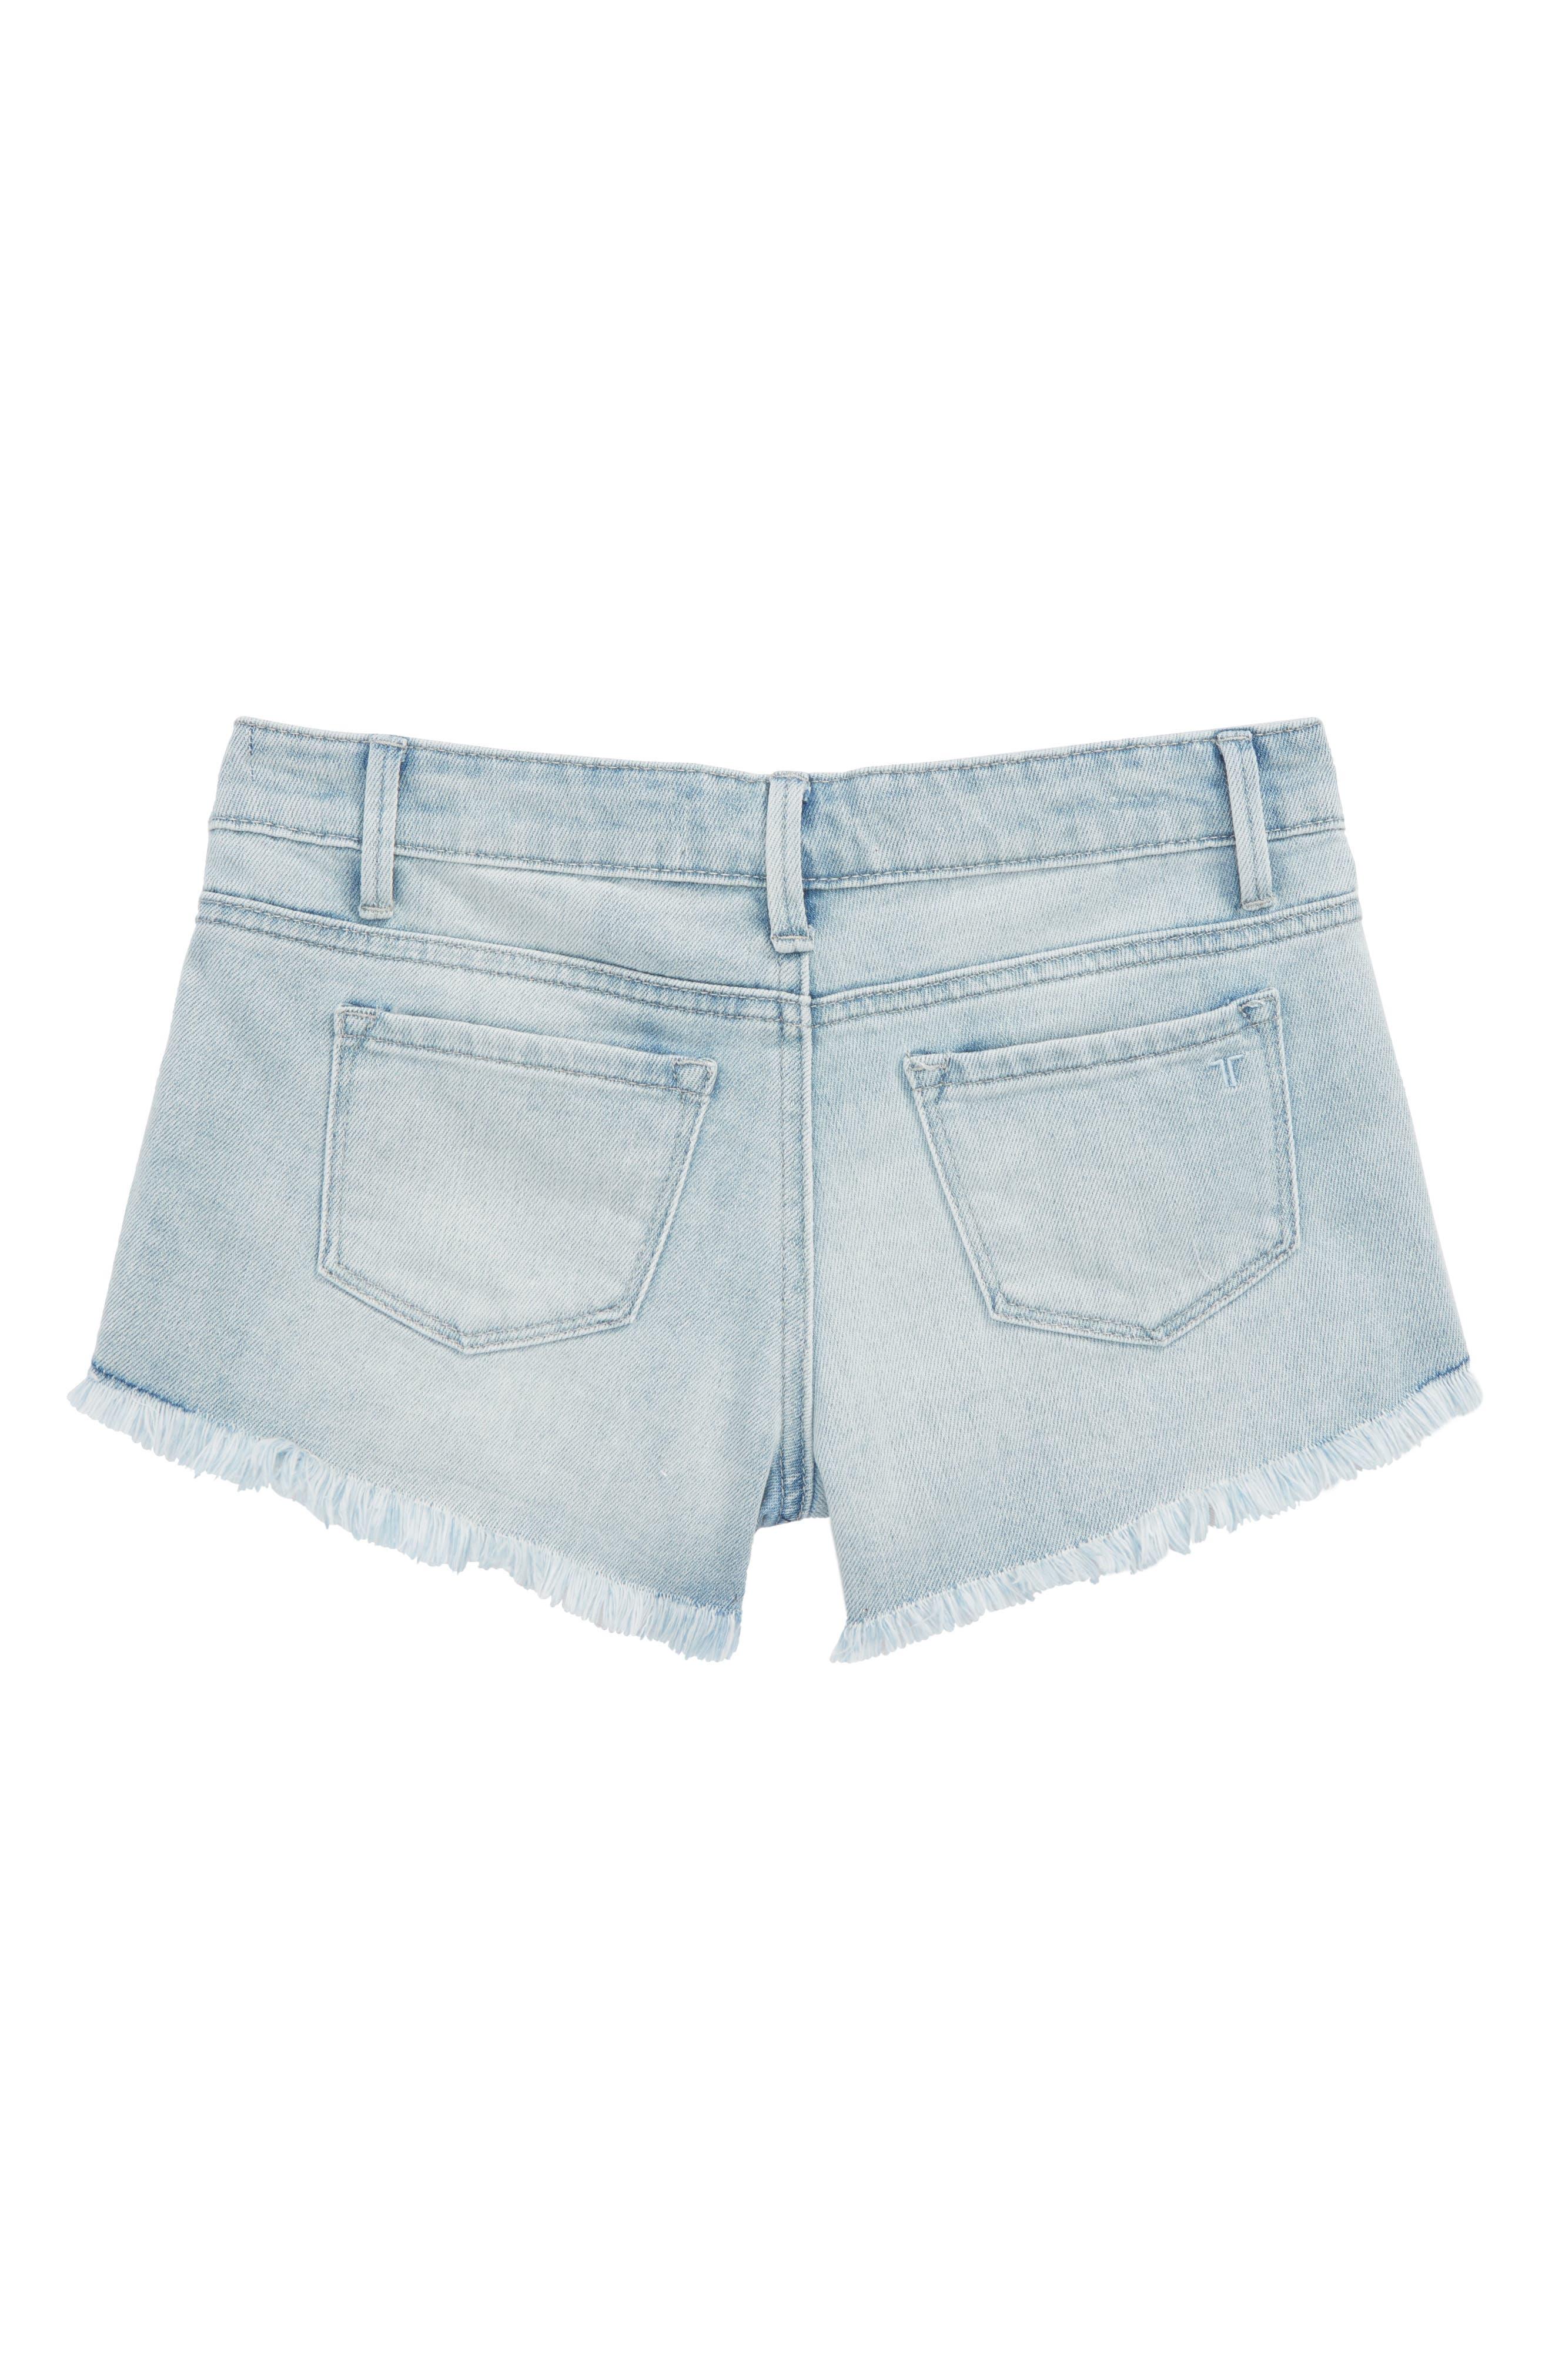 Lace Denim Shorts,                             Alternate thumbnail 2, color,                             Light Indigo